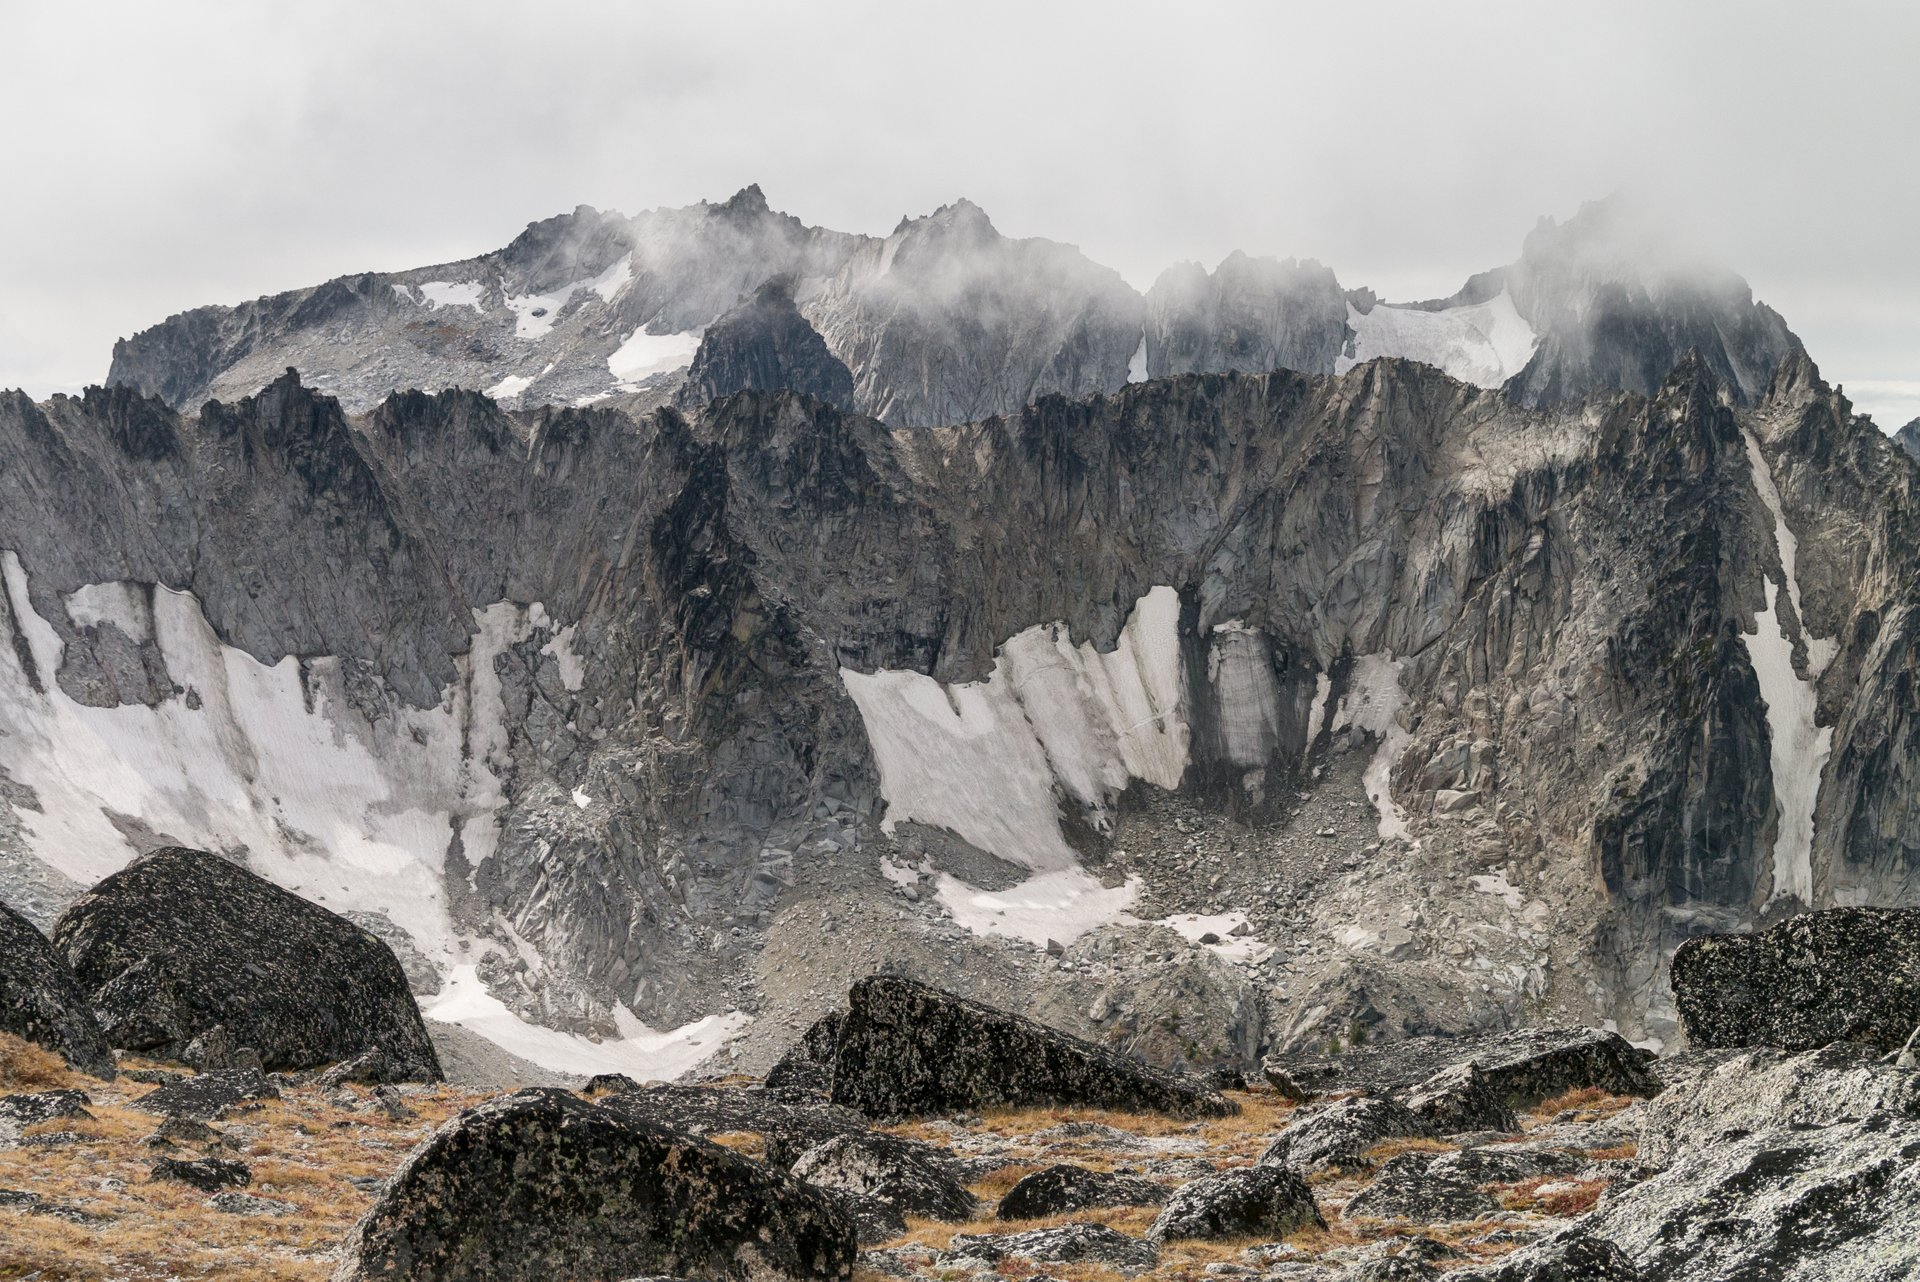 Enchantment Range from Druid Plateau 2020